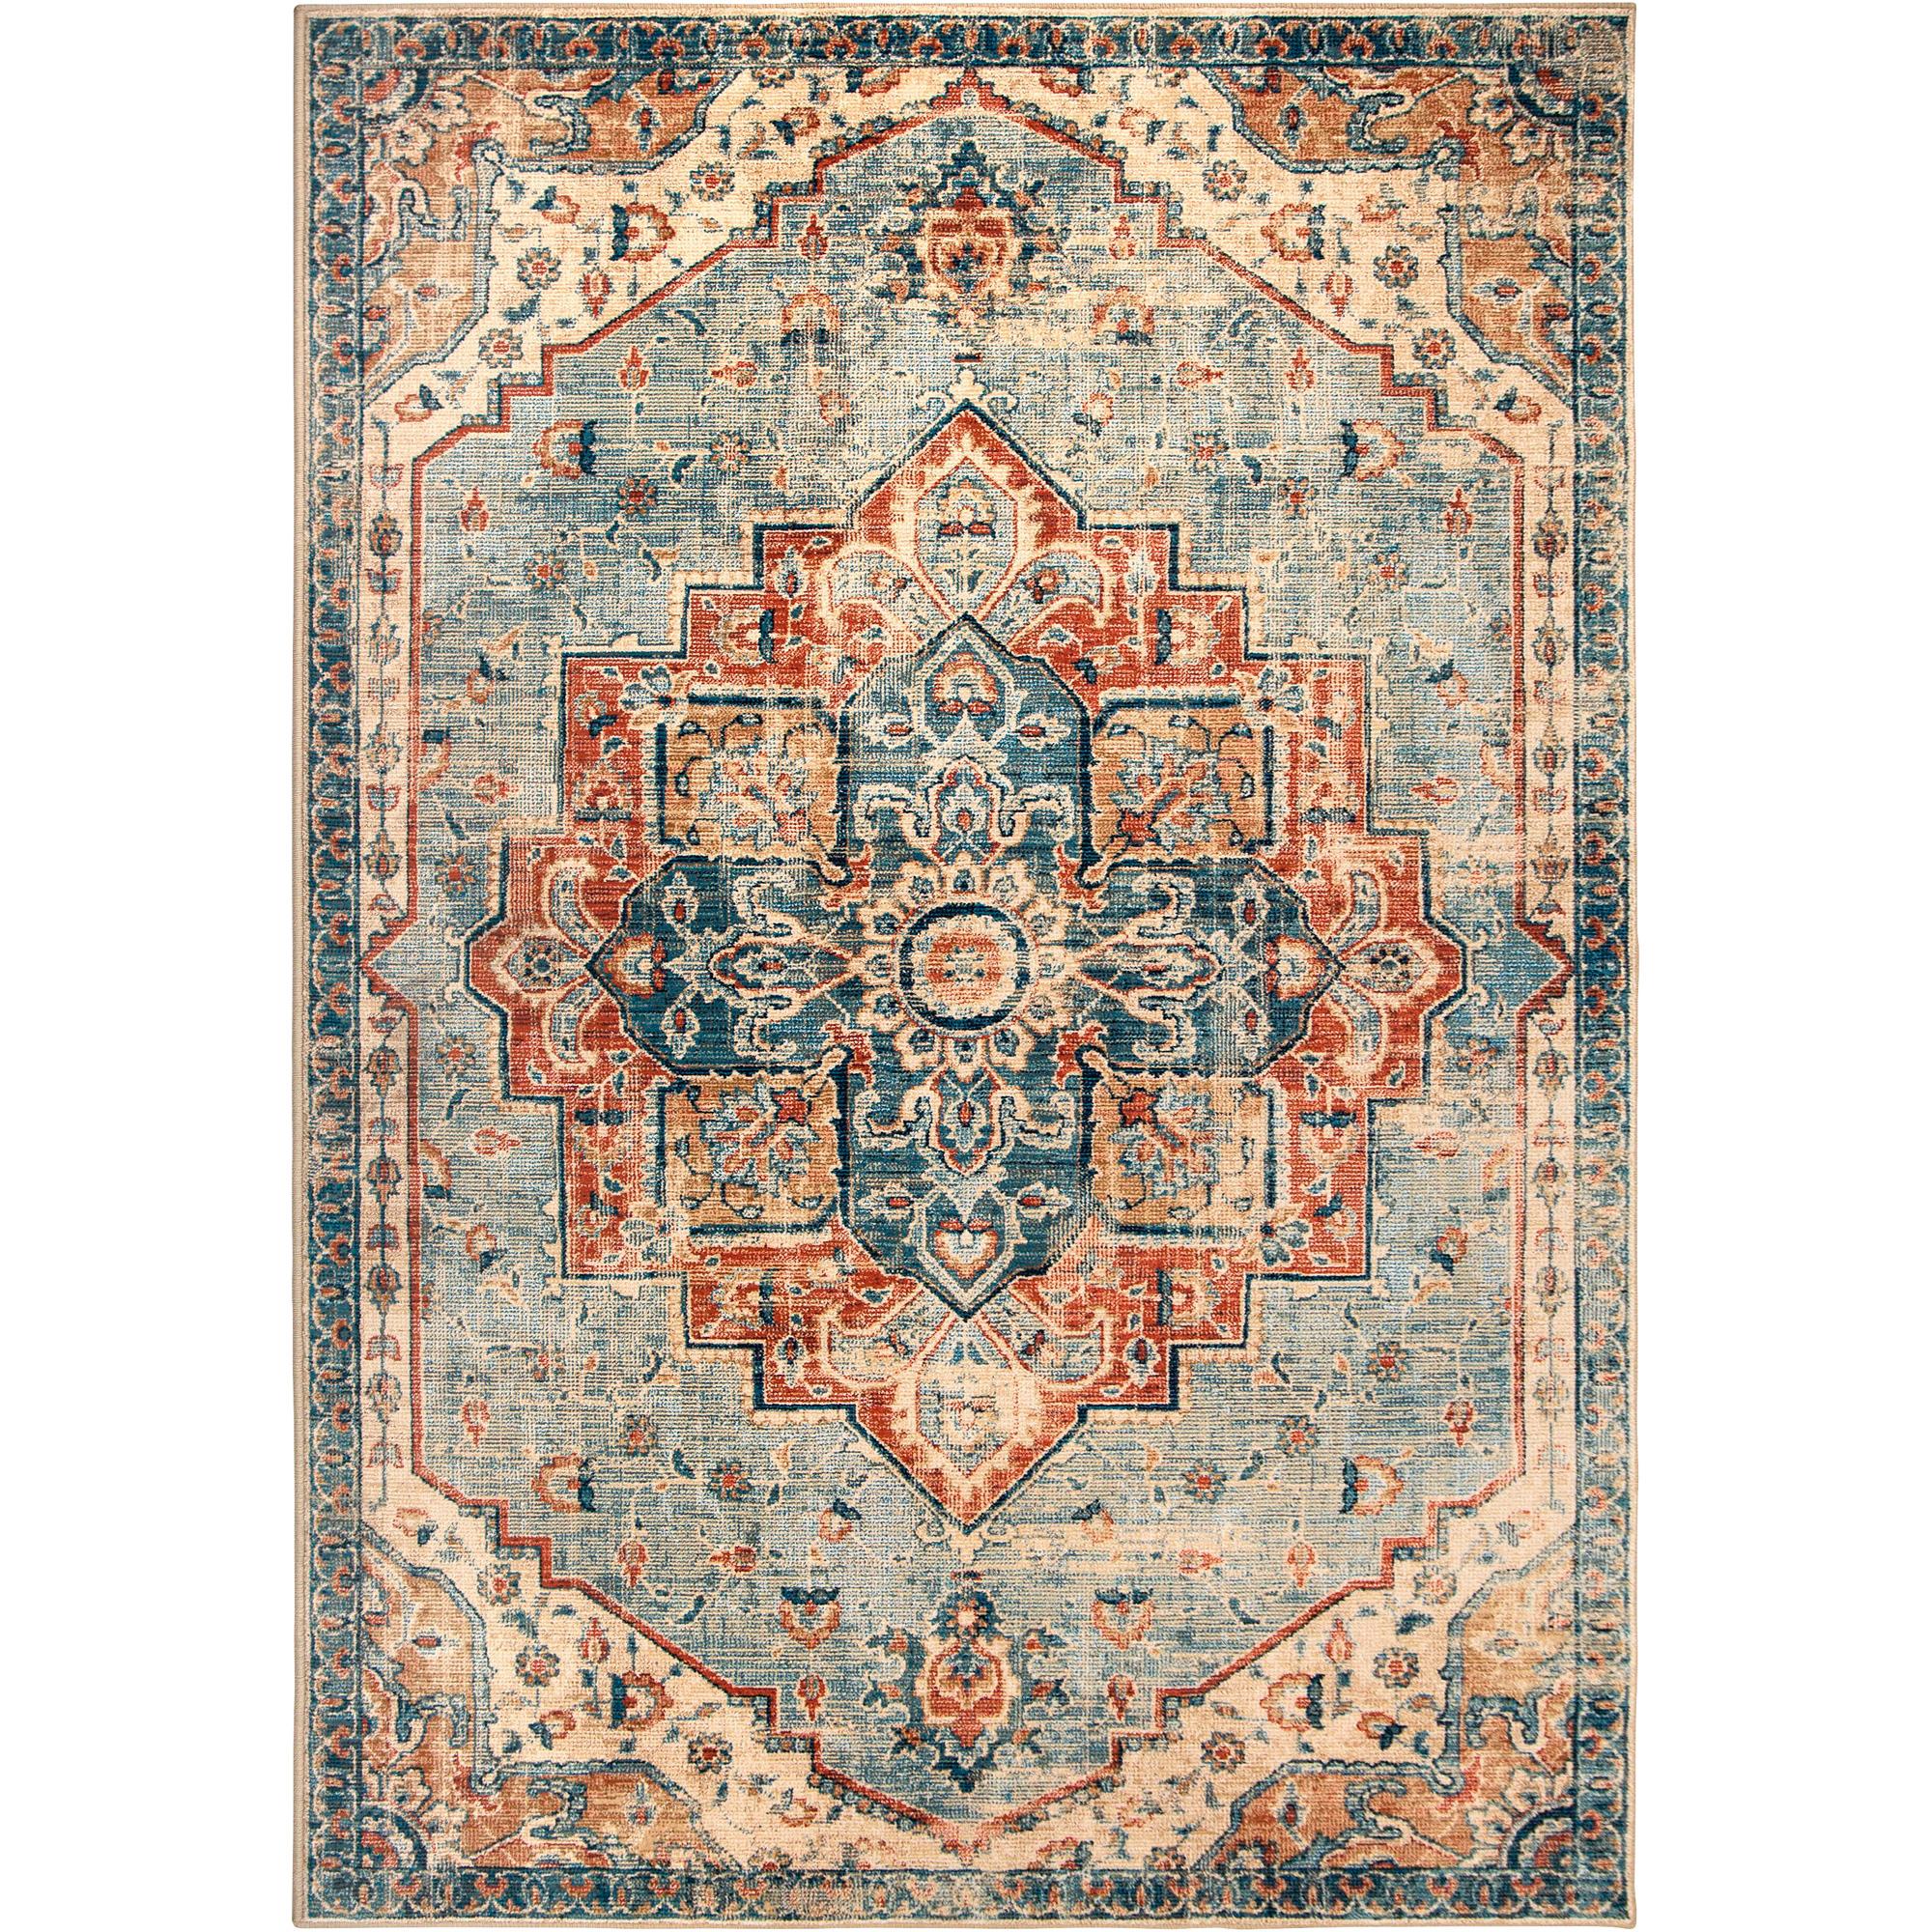 Orian | Alexandria King Fisher Pale Blue 7x10 Area Rug